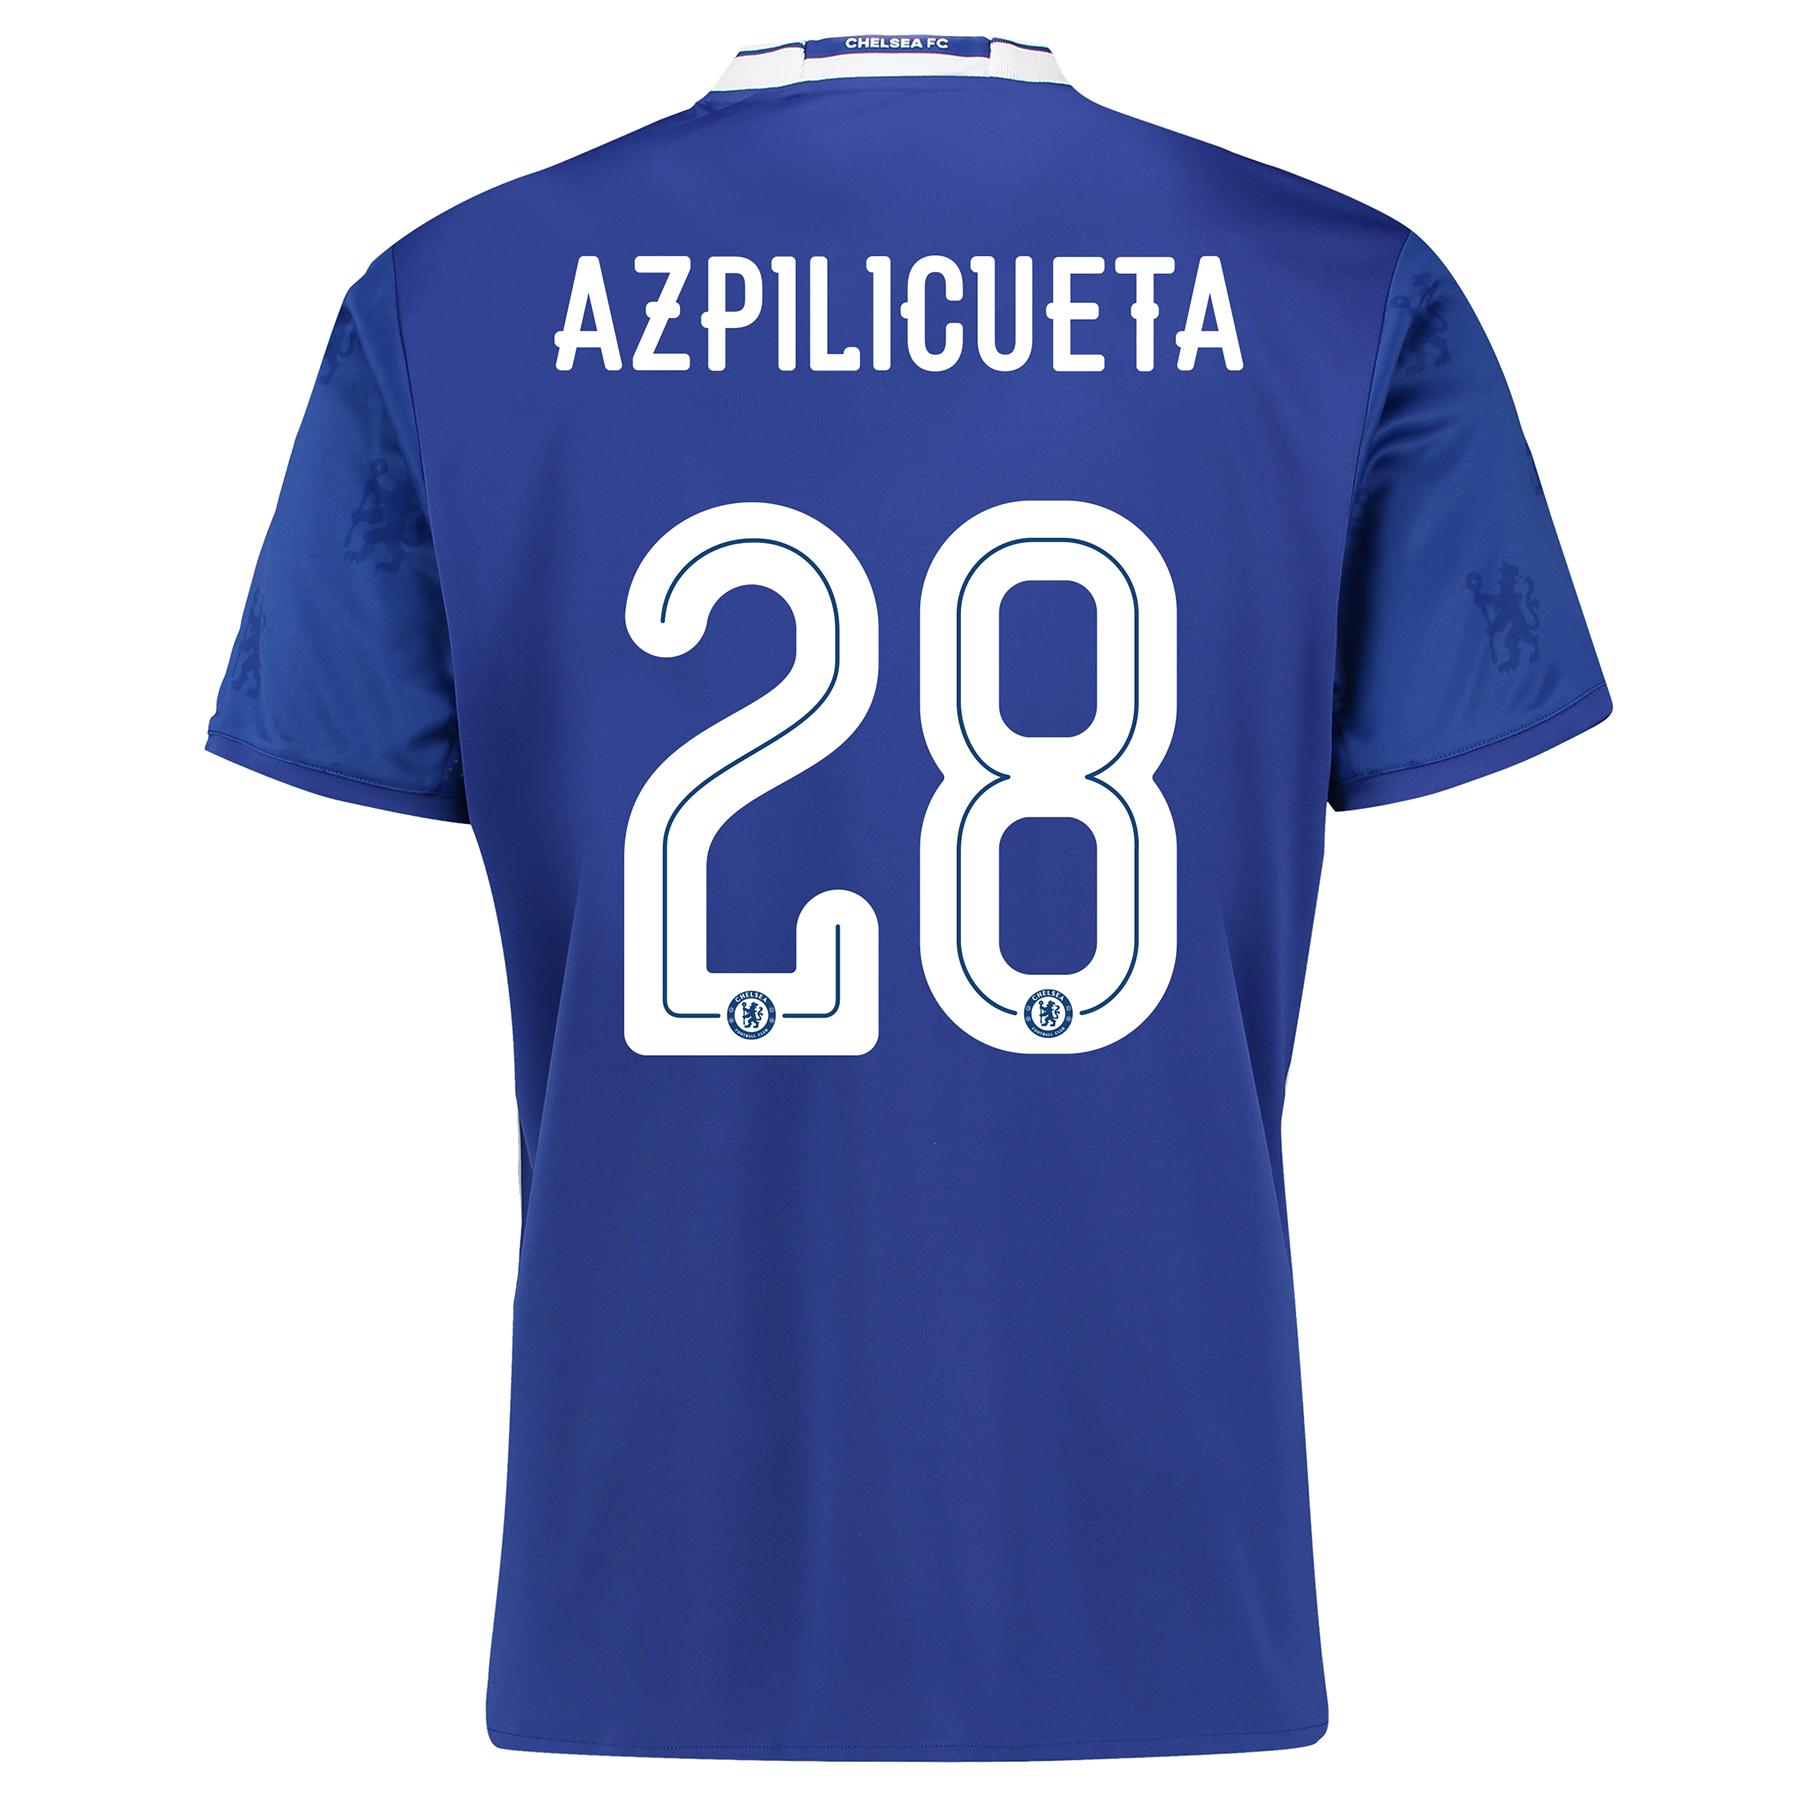 Chelsea Linear Home Shirt 2016-17 with Azpilicueta 28 printing